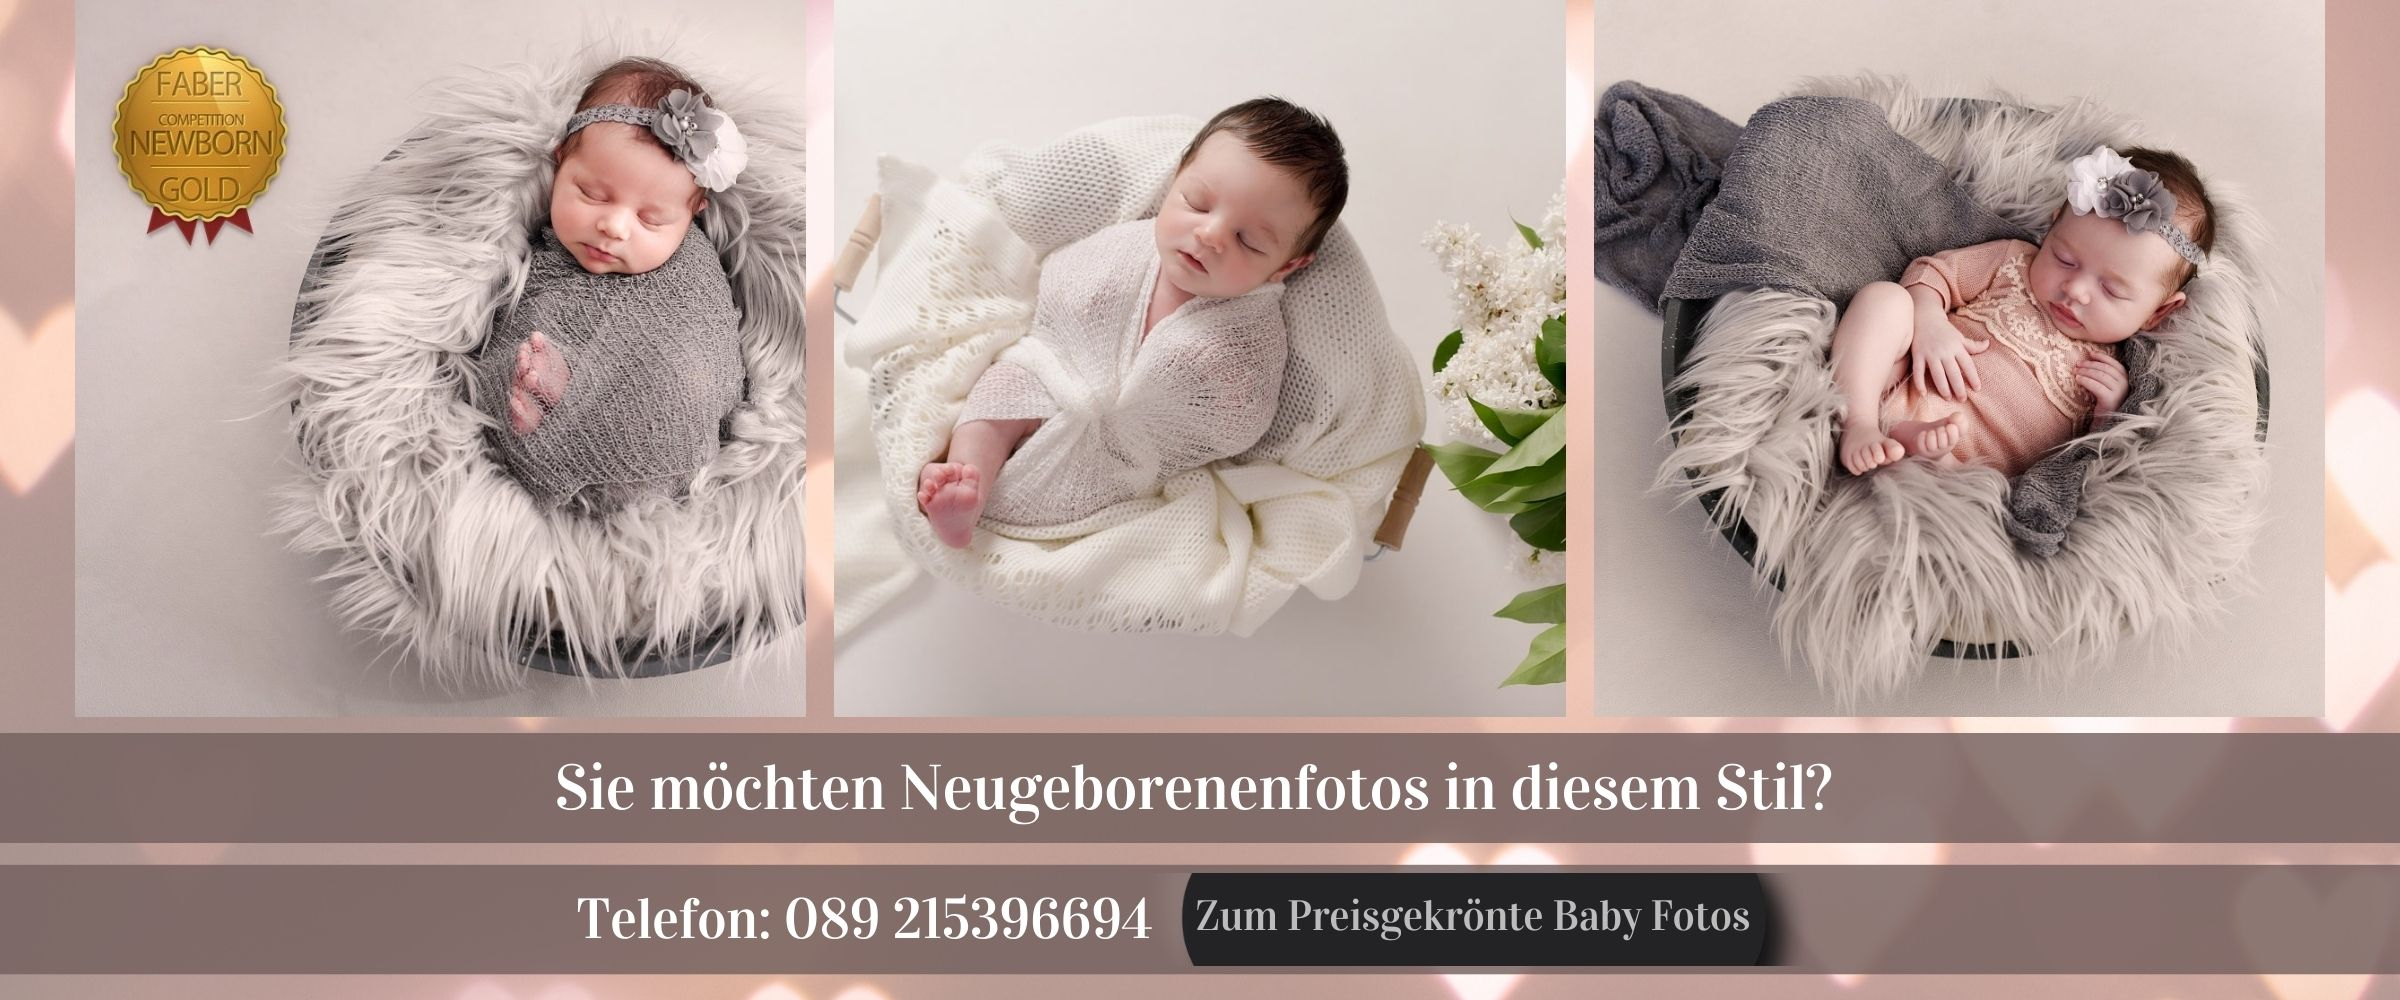 Preisgekrönte Neugeborenen Fotos Cross-Selling banner